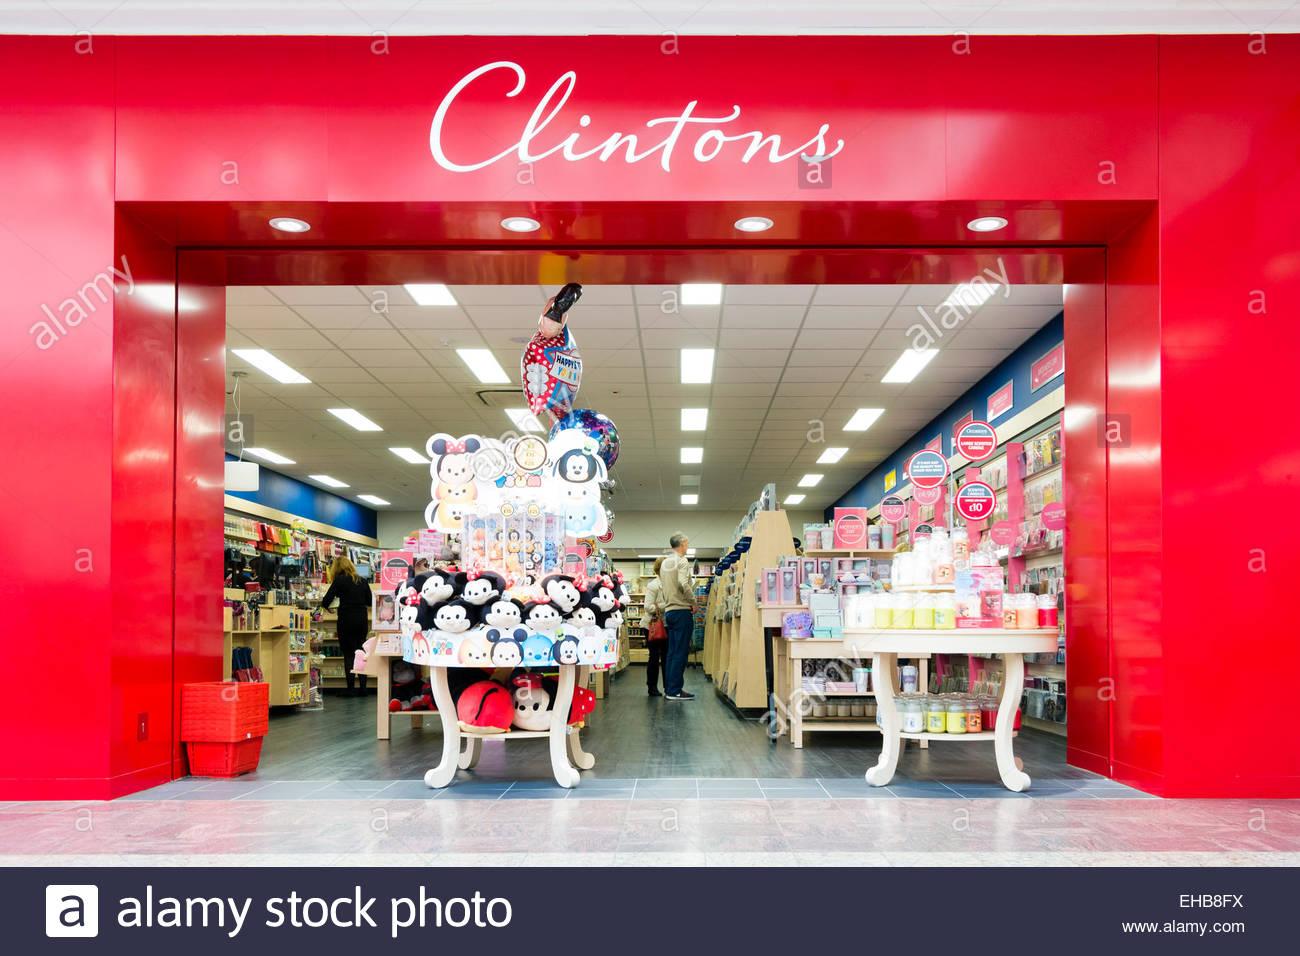 Clintons store Cribbs Causeway near Bristol, UK. Stock Photo